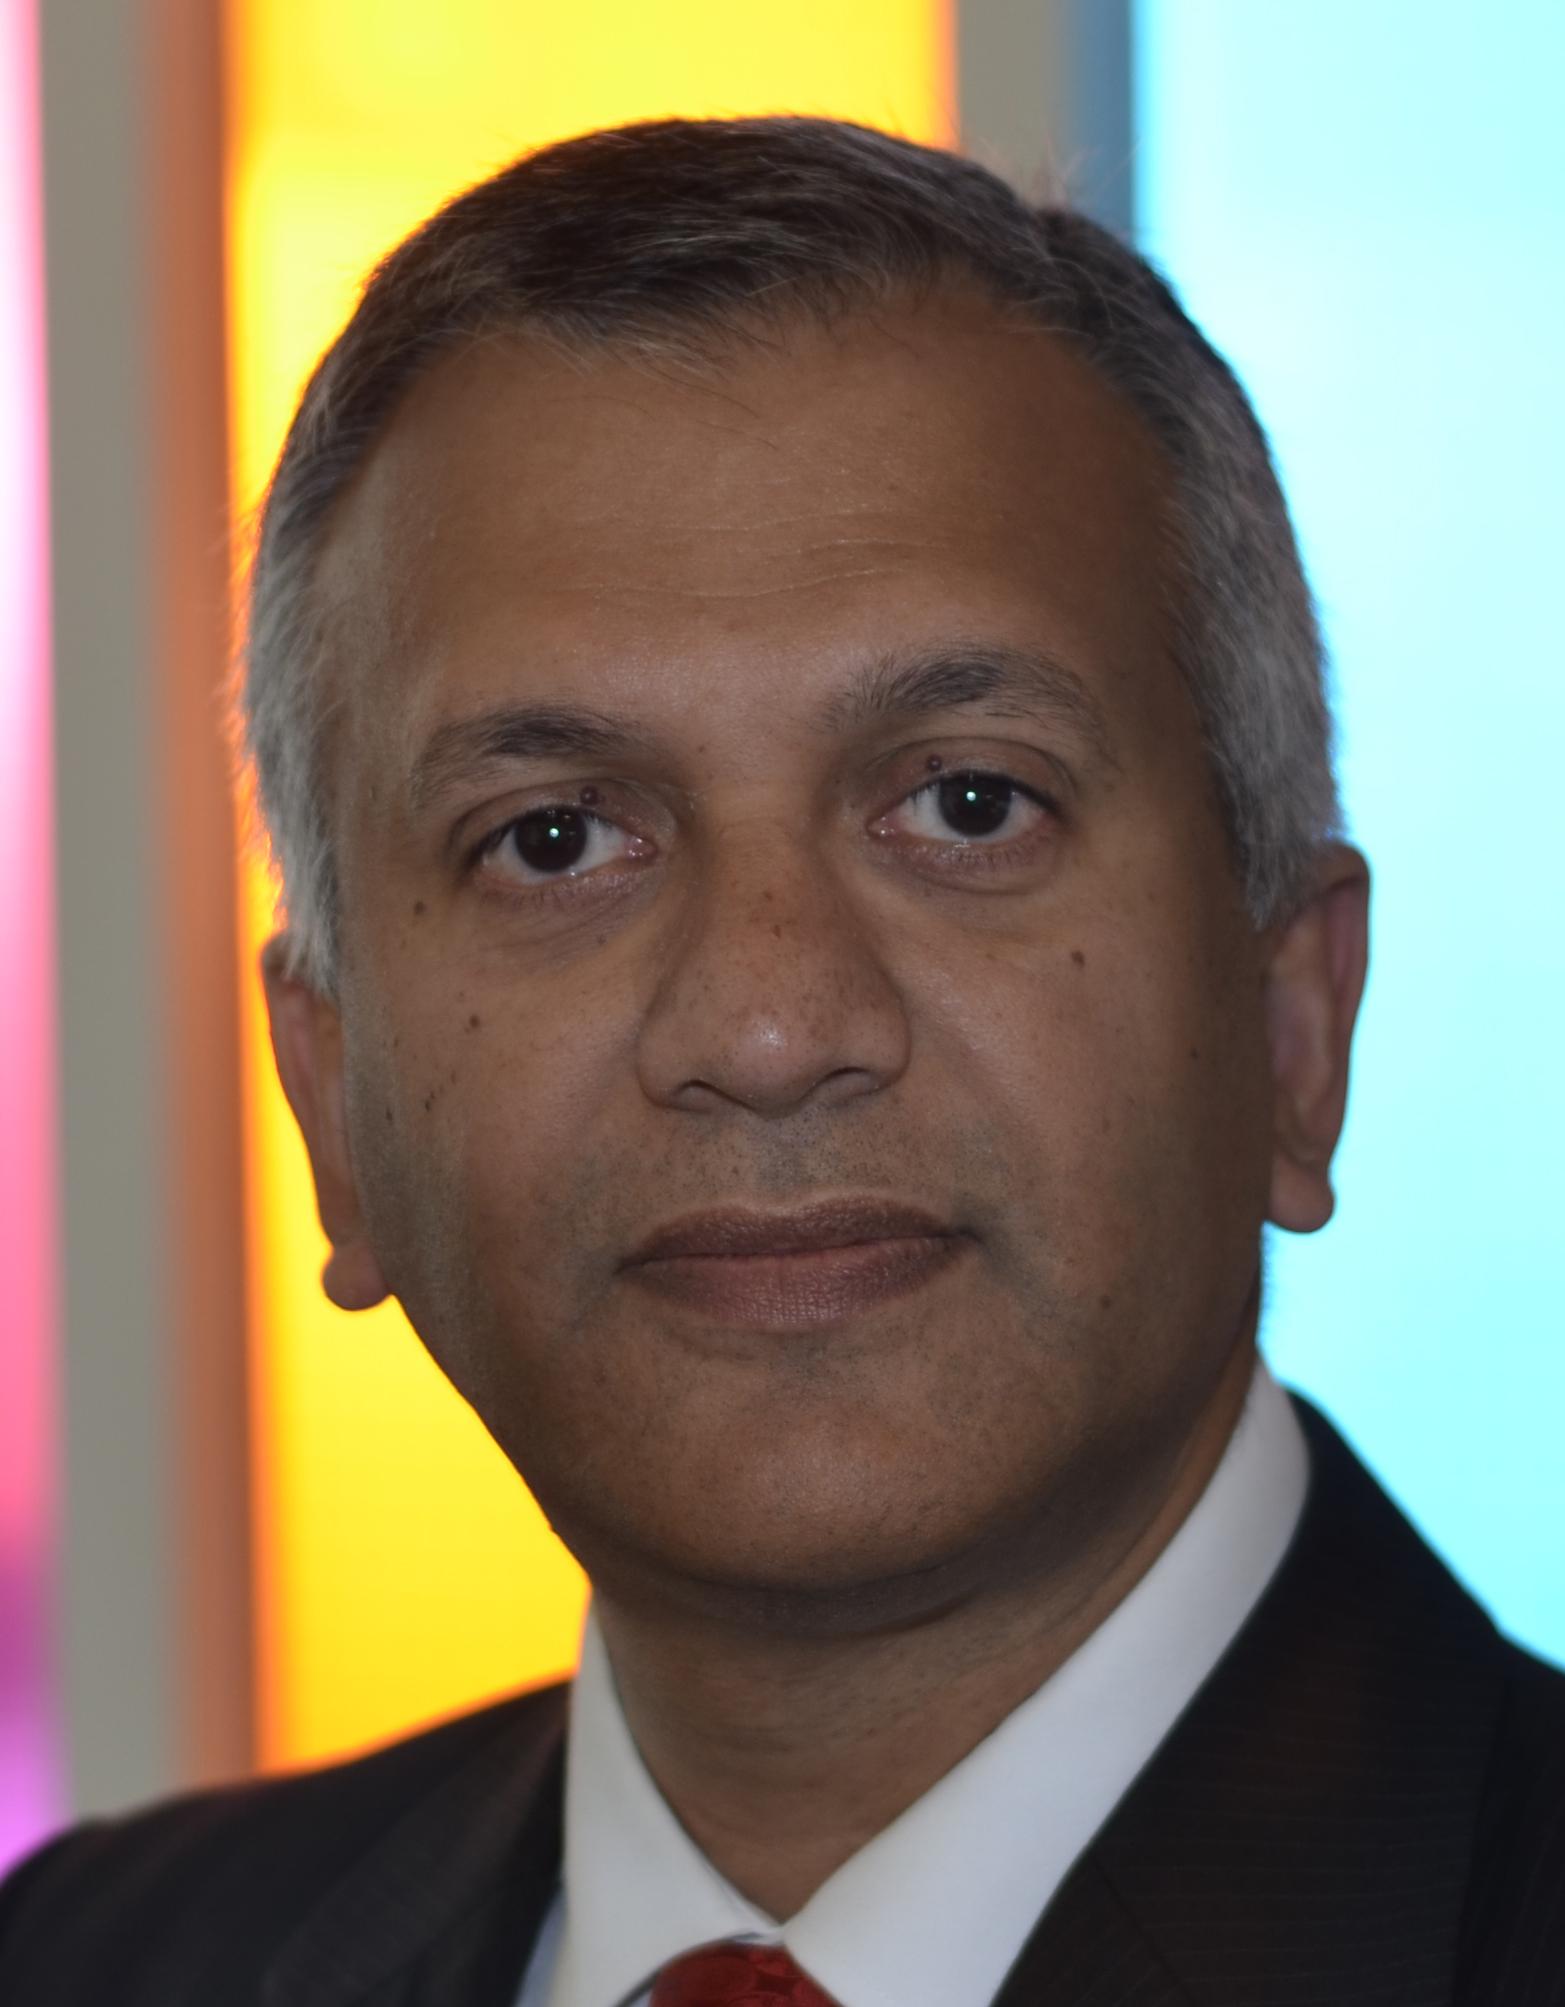 Professor Rajkumar Roy, Director of Manufacturing, Cranfield University.